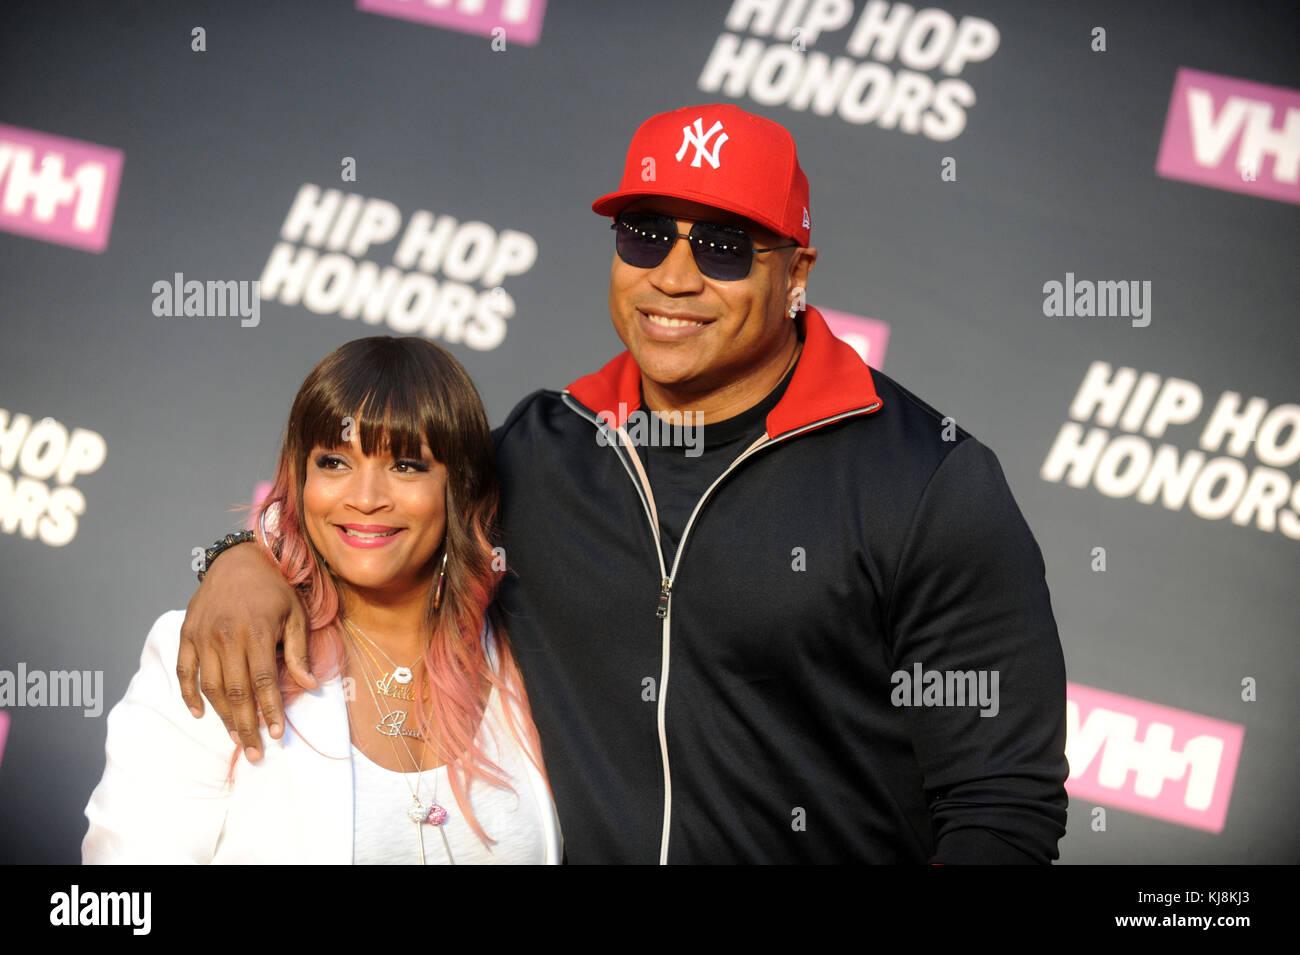 Ll Cool J Vh1 Hip Hop Honors Stock Photos Ll Cool J Vh1 Hip Hop